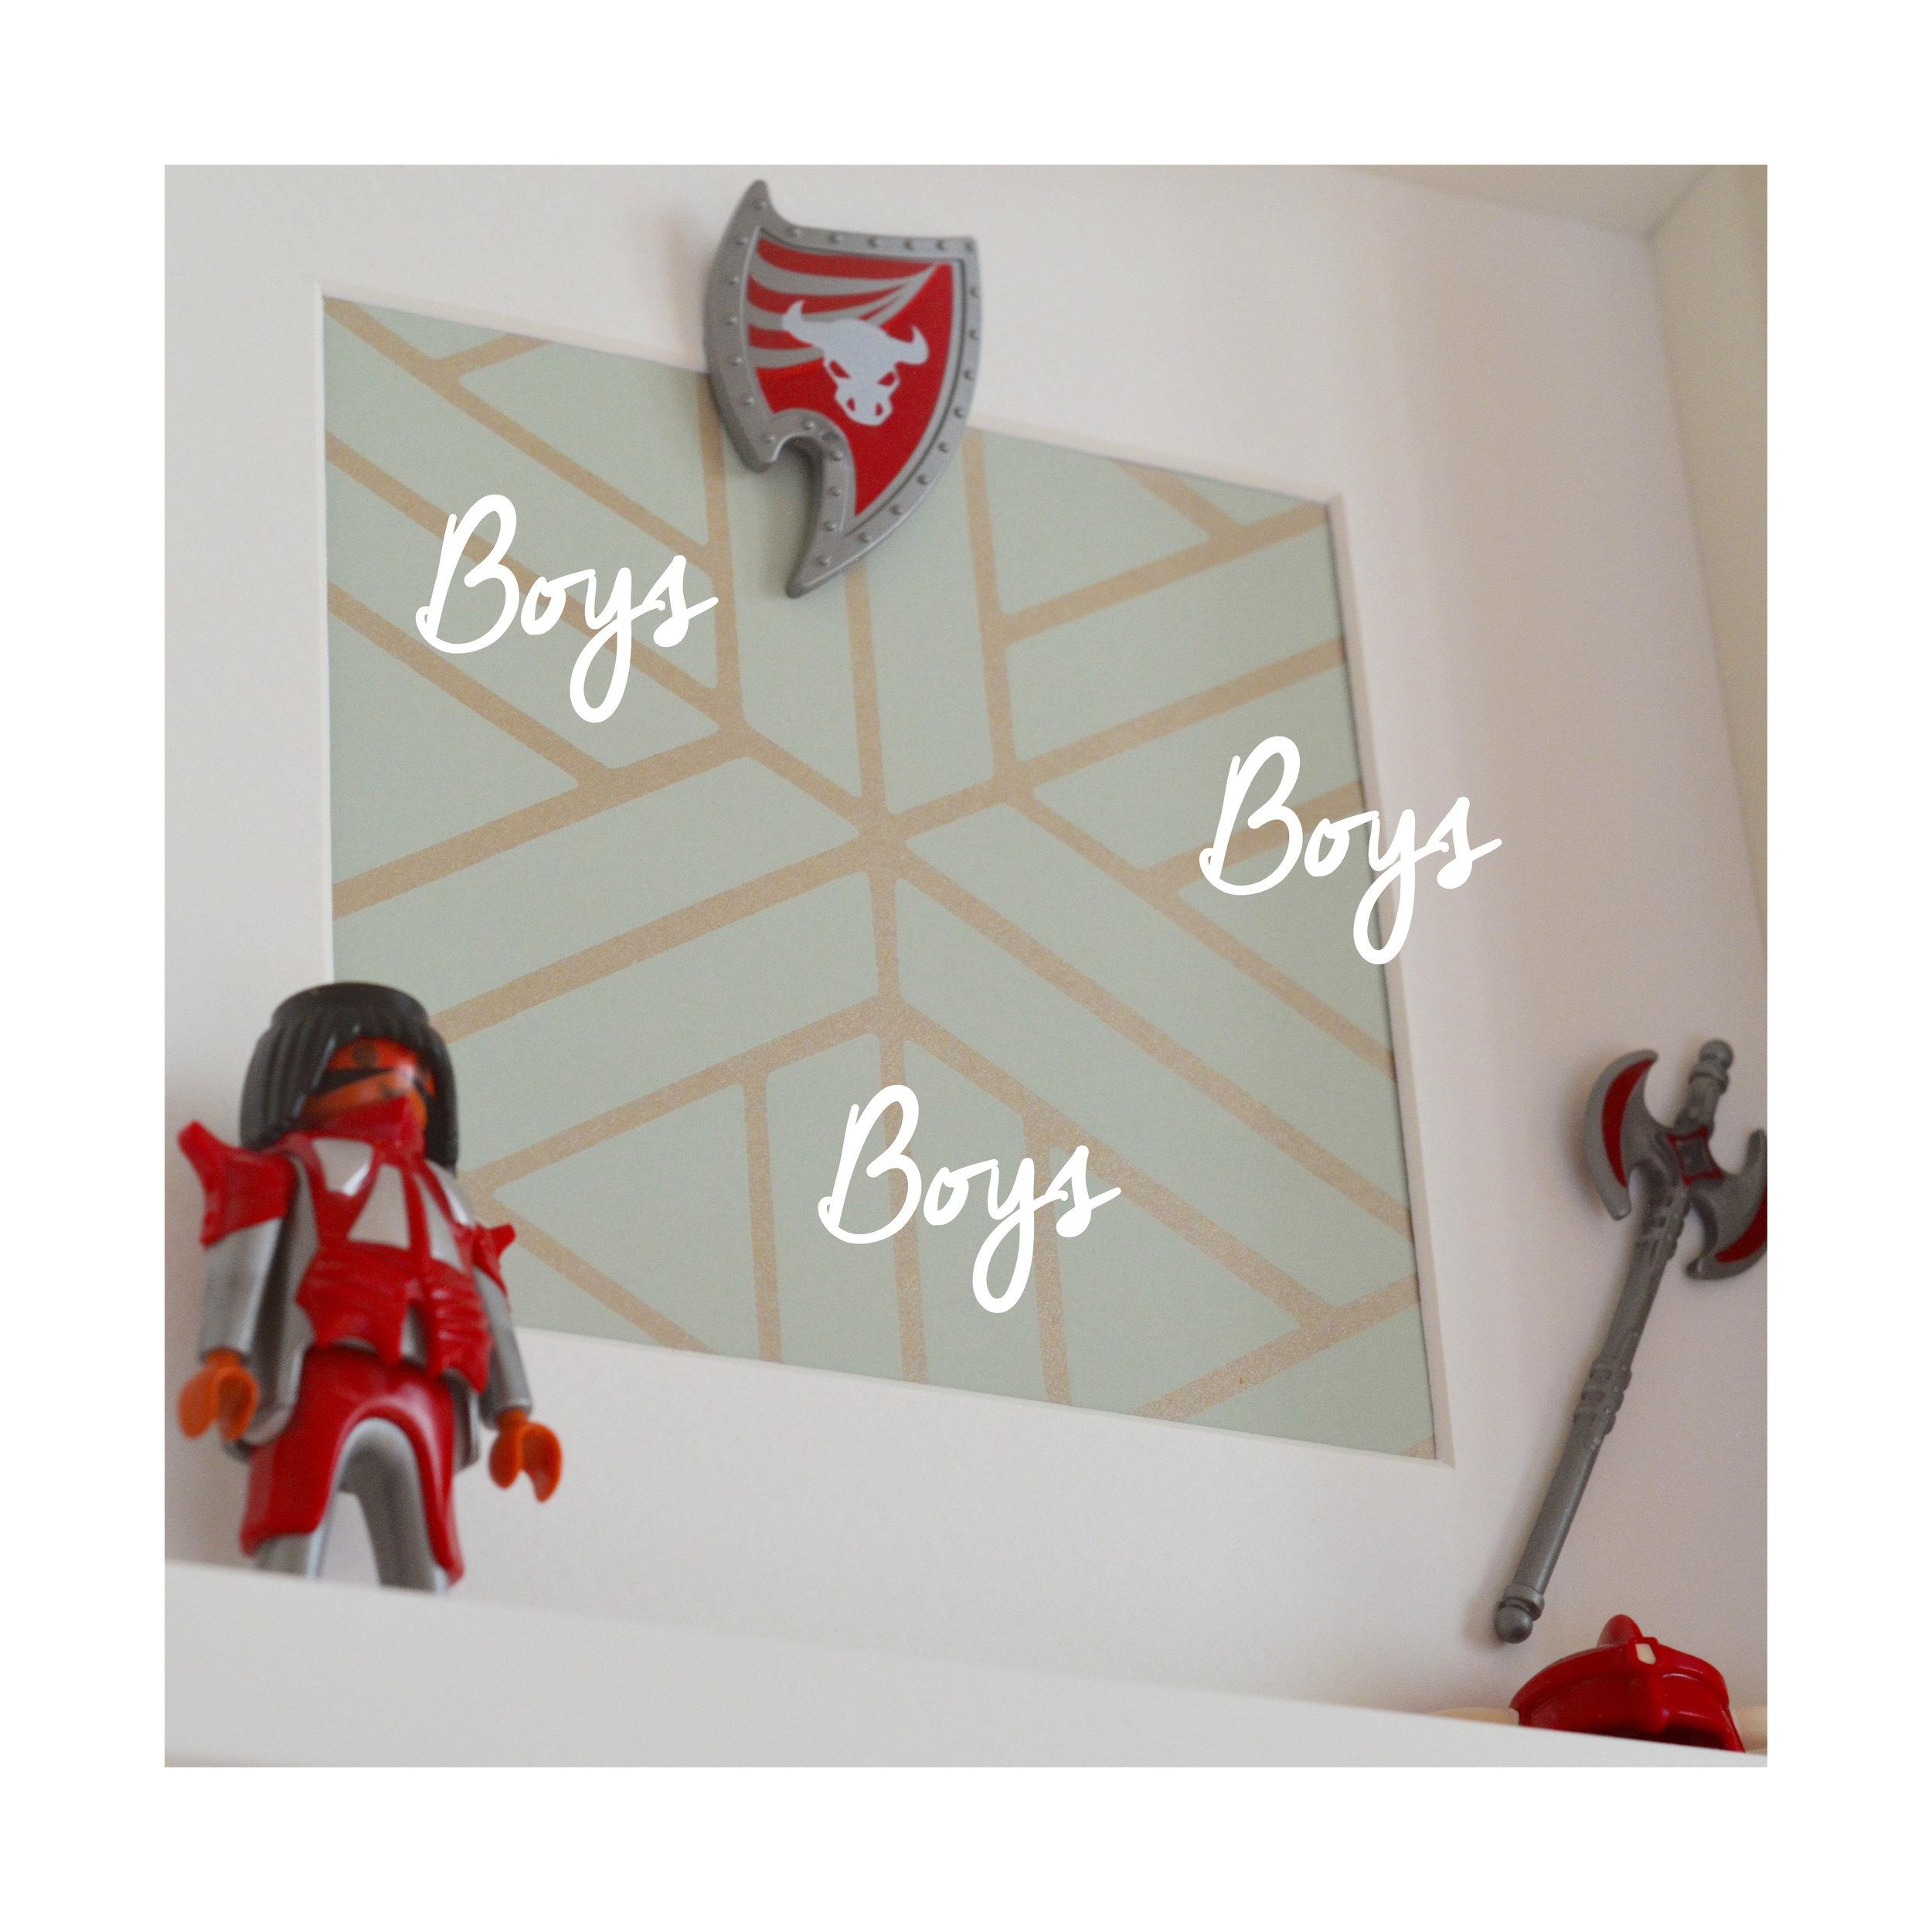 Boys boys boys.jpg